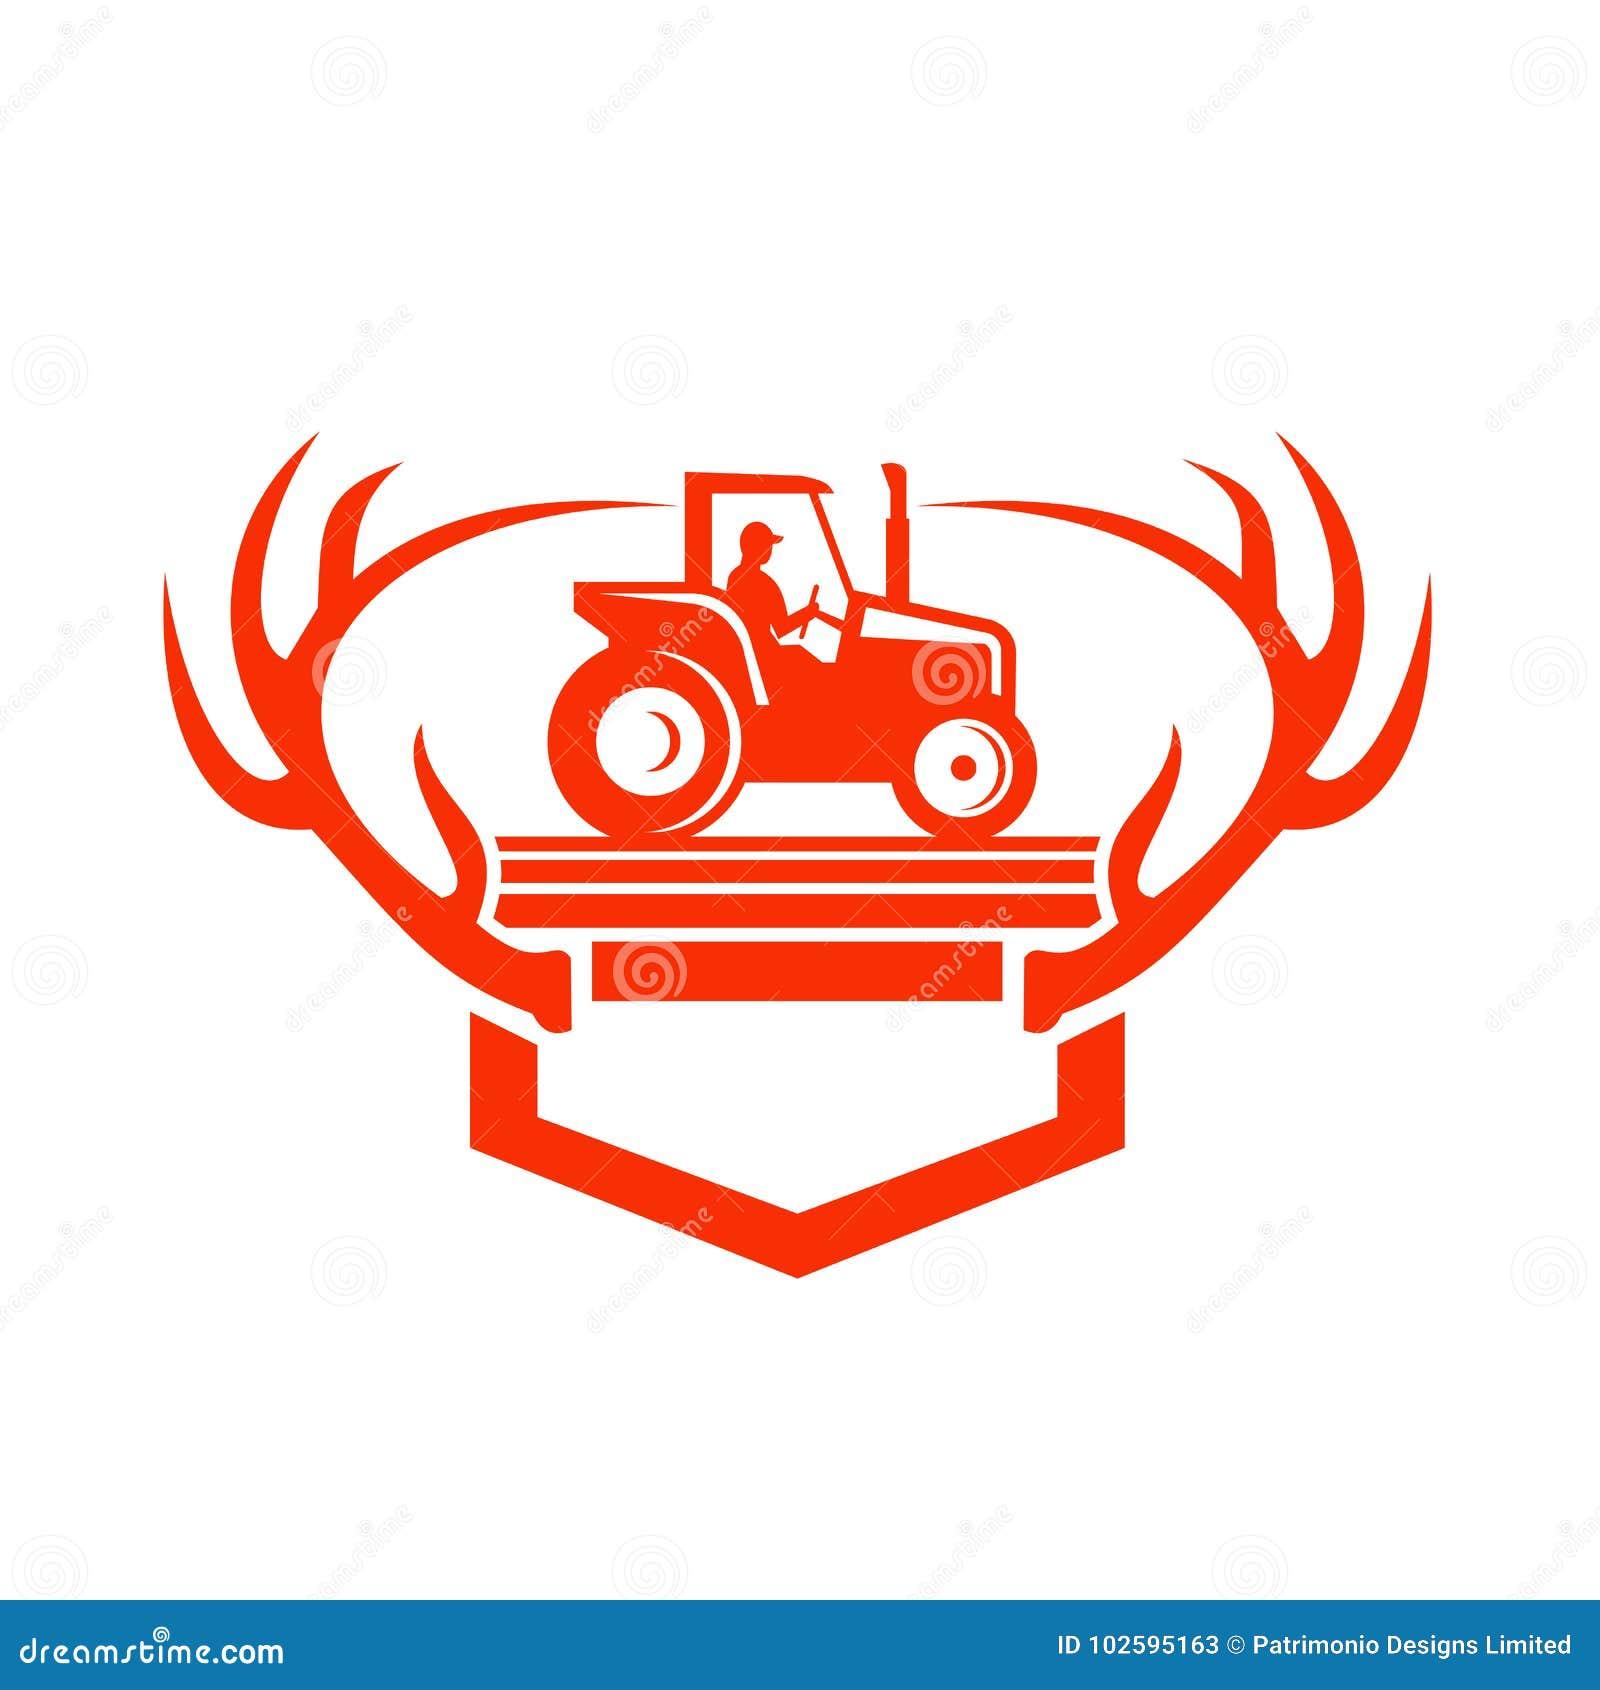 White Tail Deer Antler Tractor Retro Stock Vector - Illustration of ...